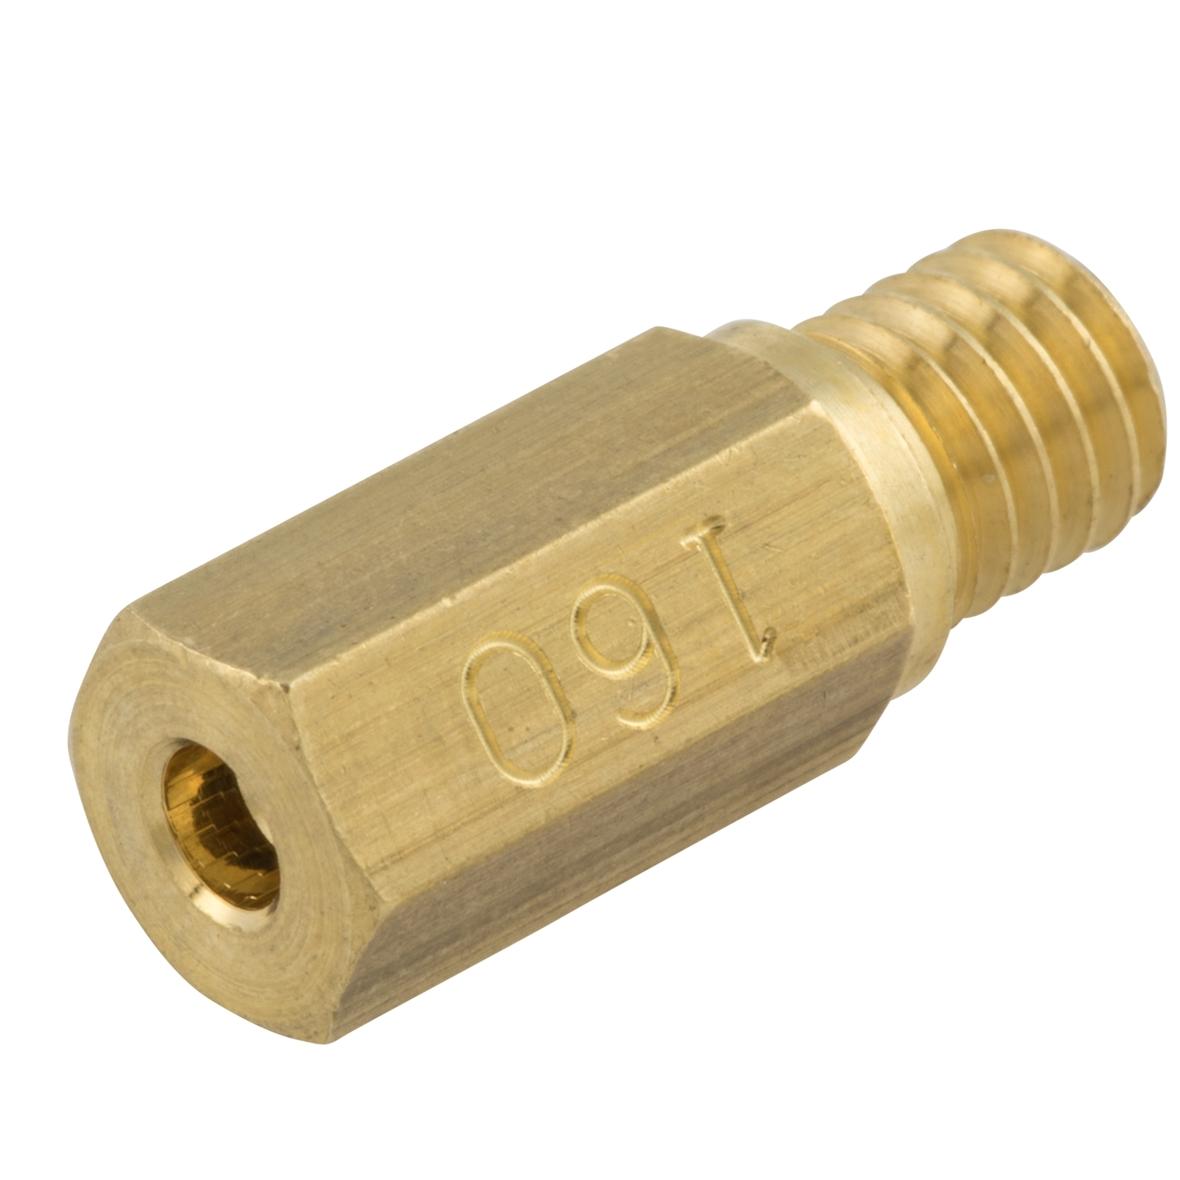 Zdjęcie produktu dla 'Dysza KMT 125 Ø 6 mmTitle'